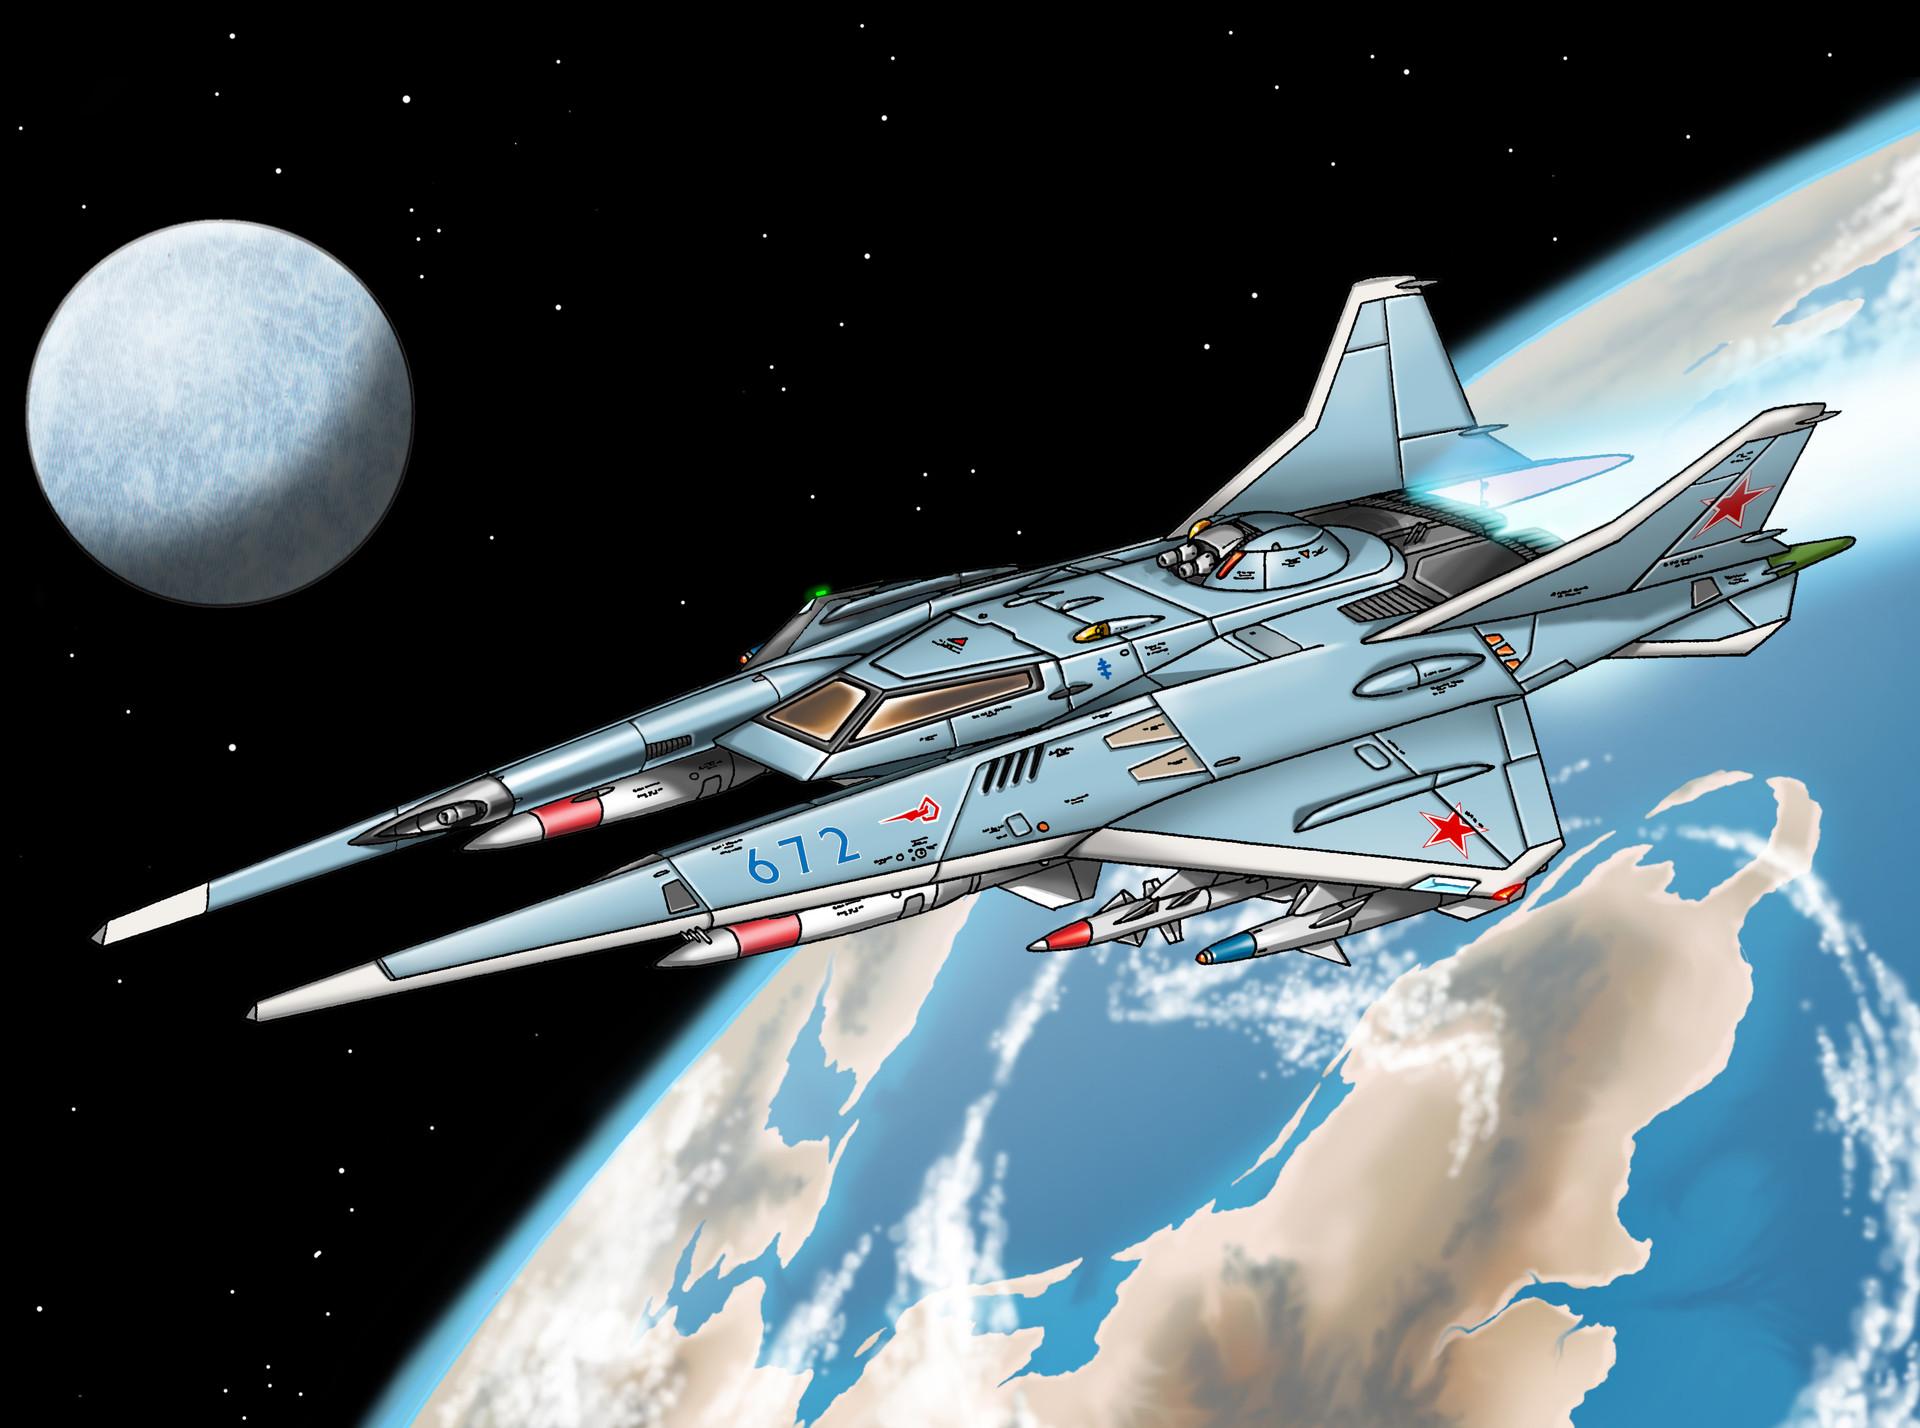 lee-madison-russianattackcraft-color-v2-